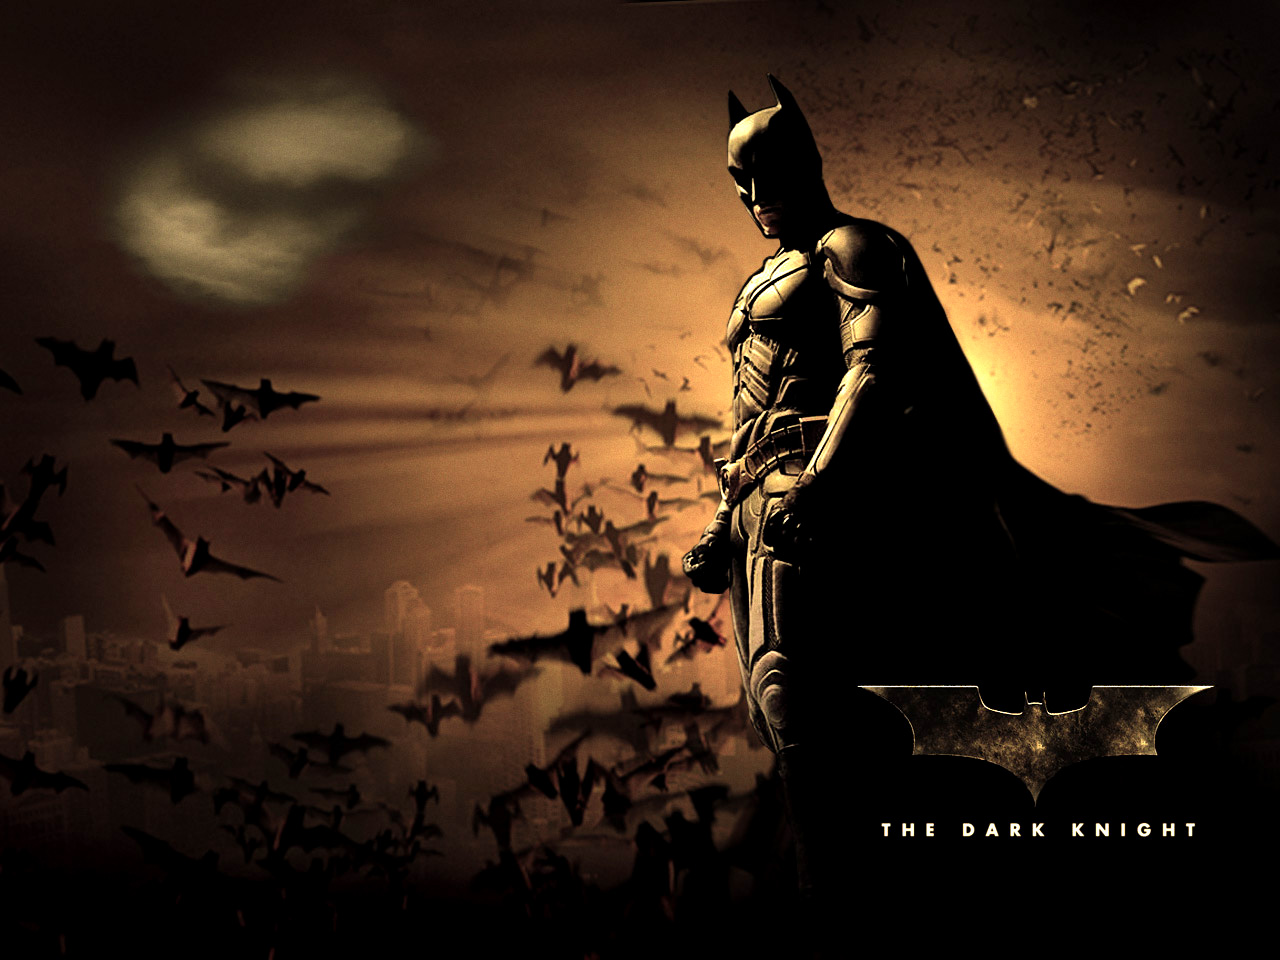 Batman Logo Wallpaper 1280x960 Batman Logo 1280x960